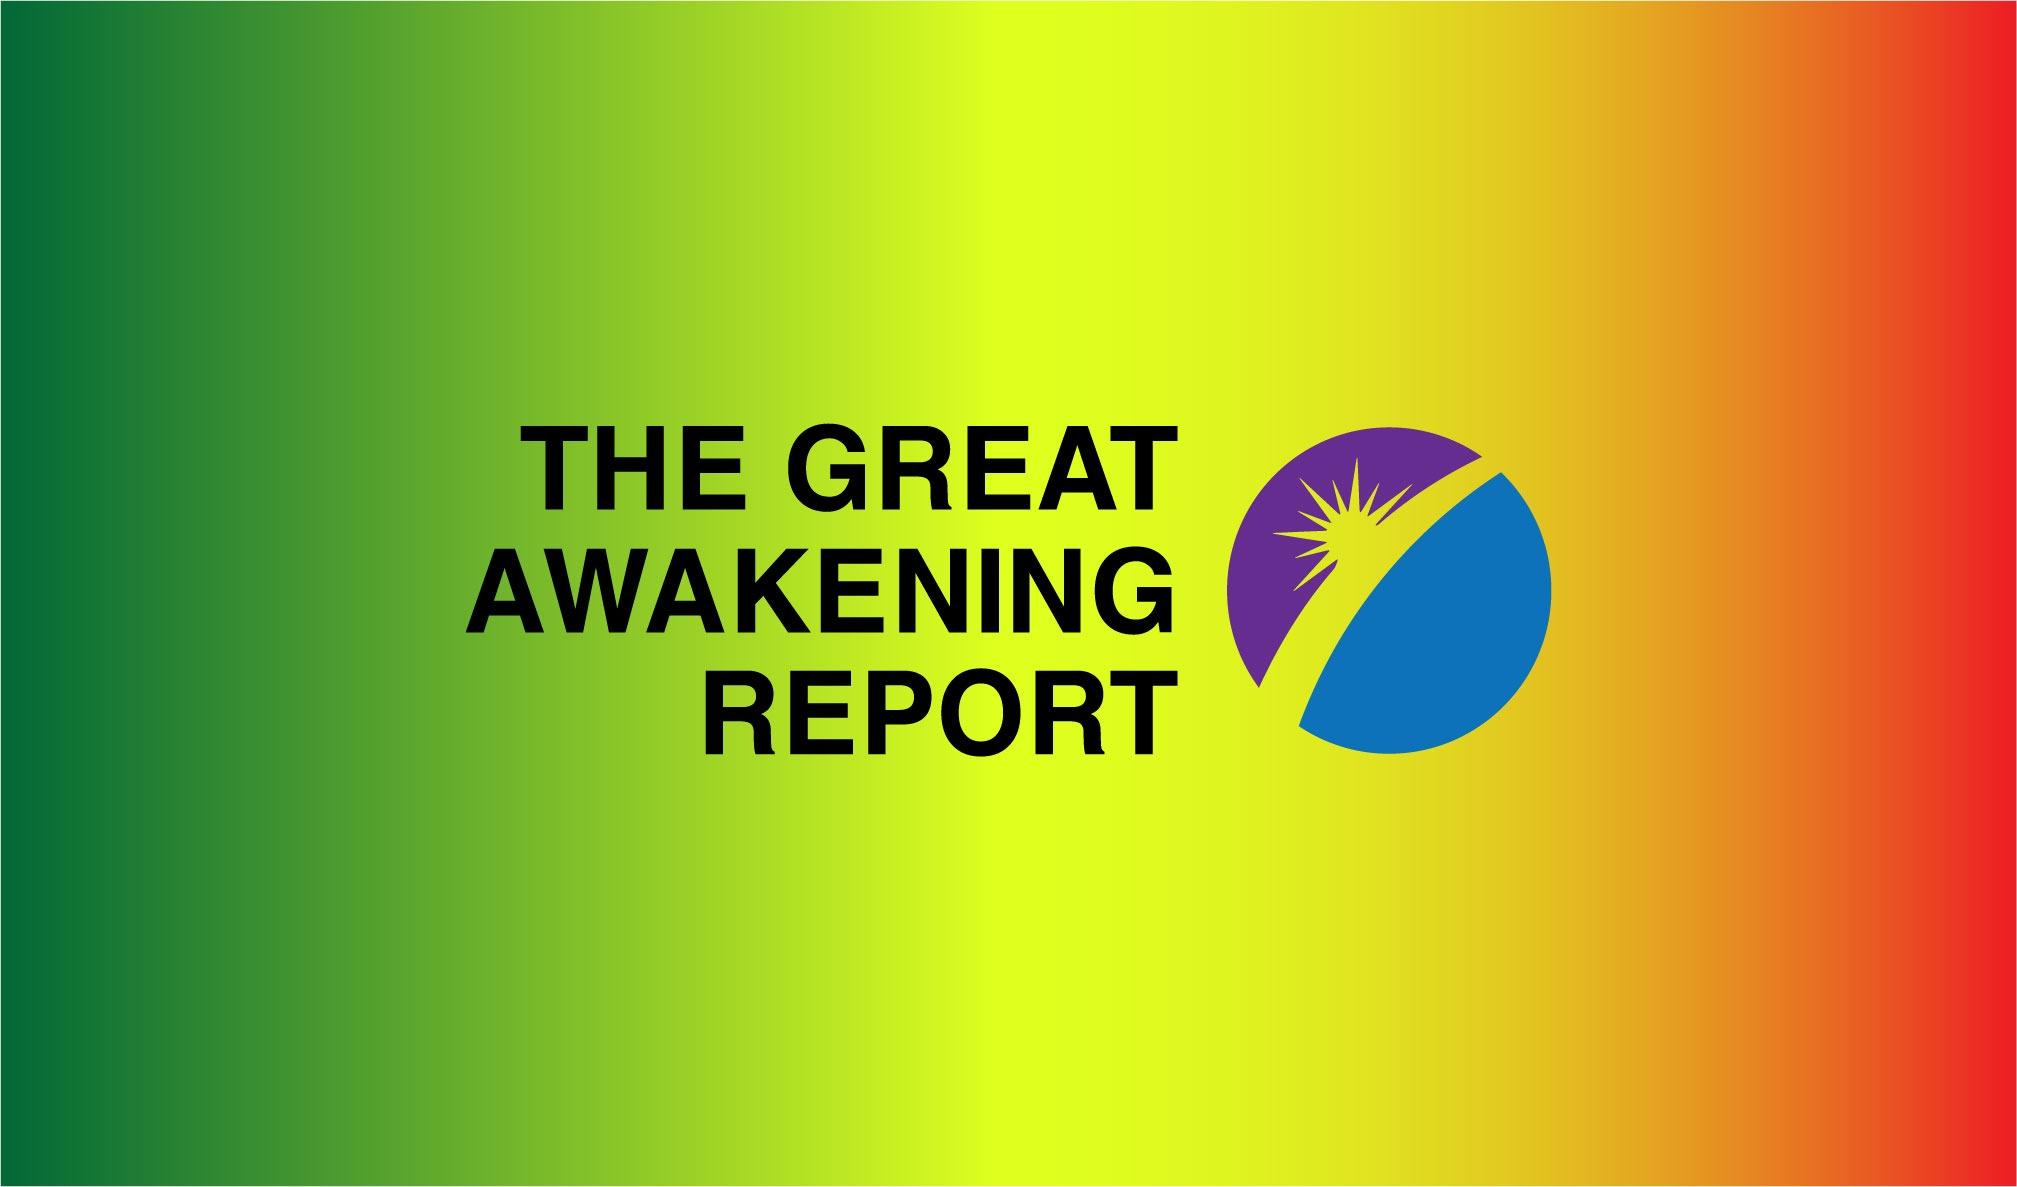 Truth, Awakening, Disclosure